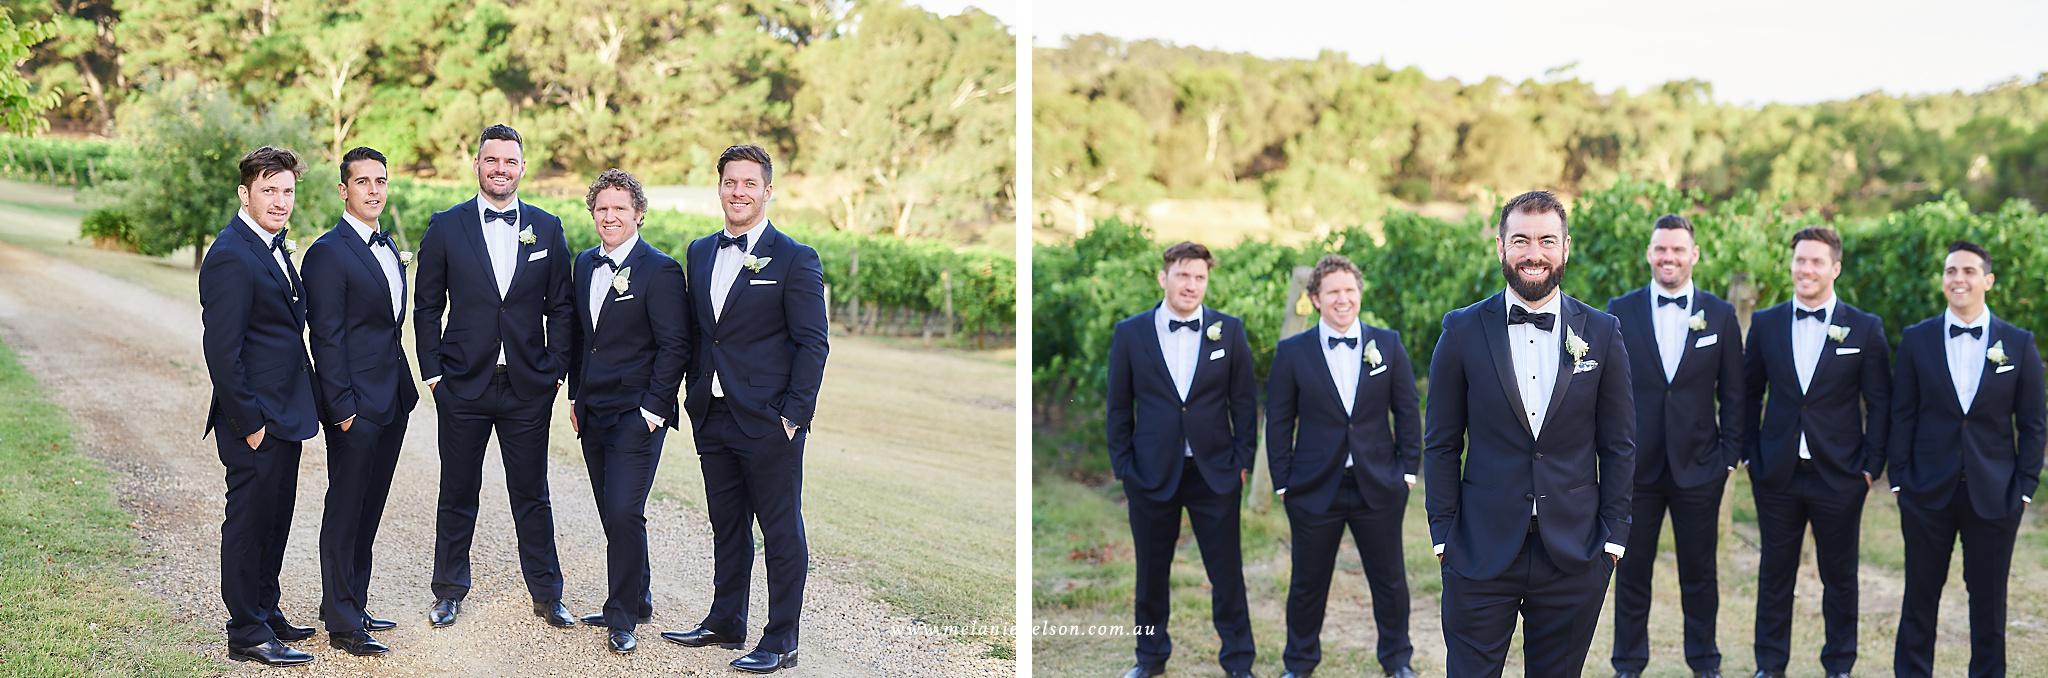 longview_vineyard_wedding_0063.jpg